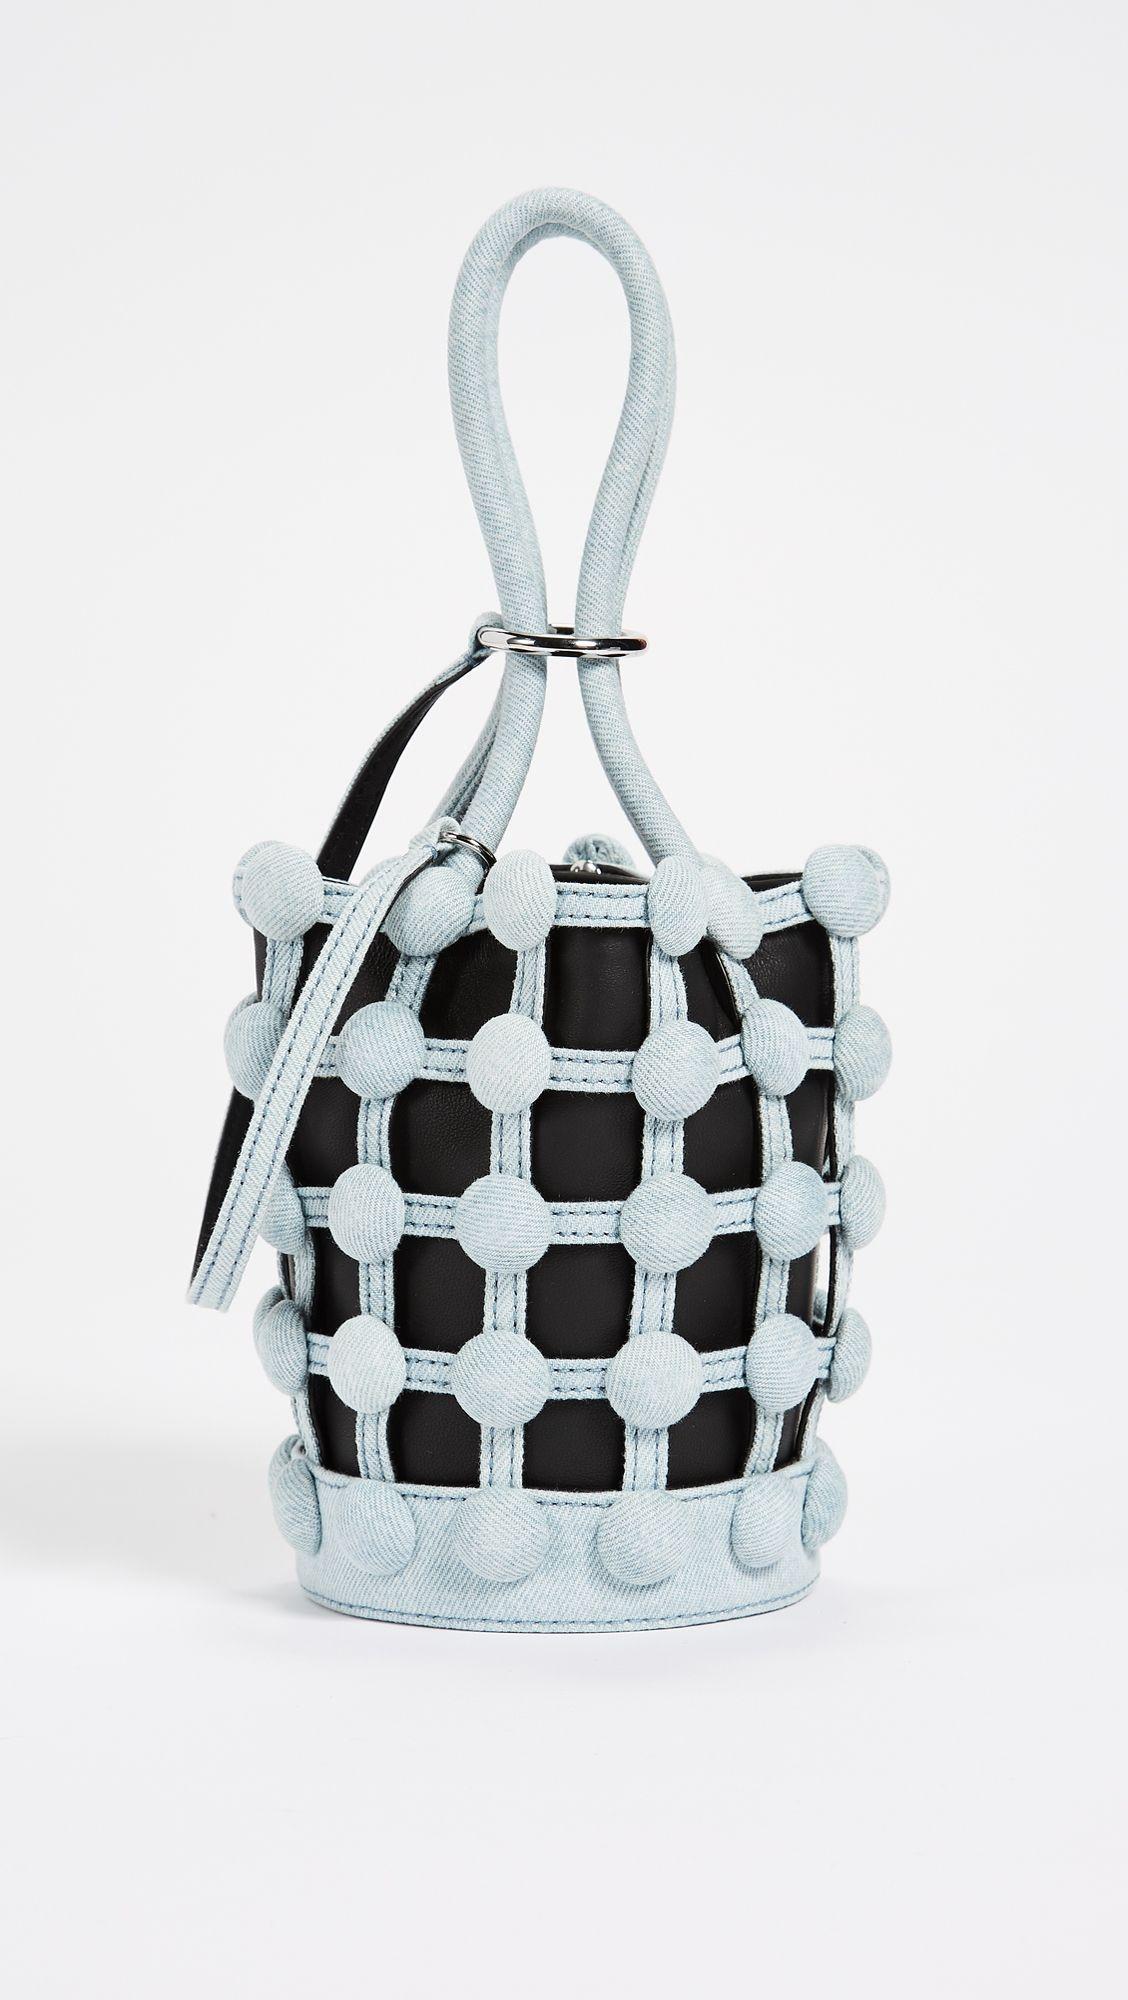 77af042948c6 Alexander Wang Roxy Cage Mini Bucket Bag